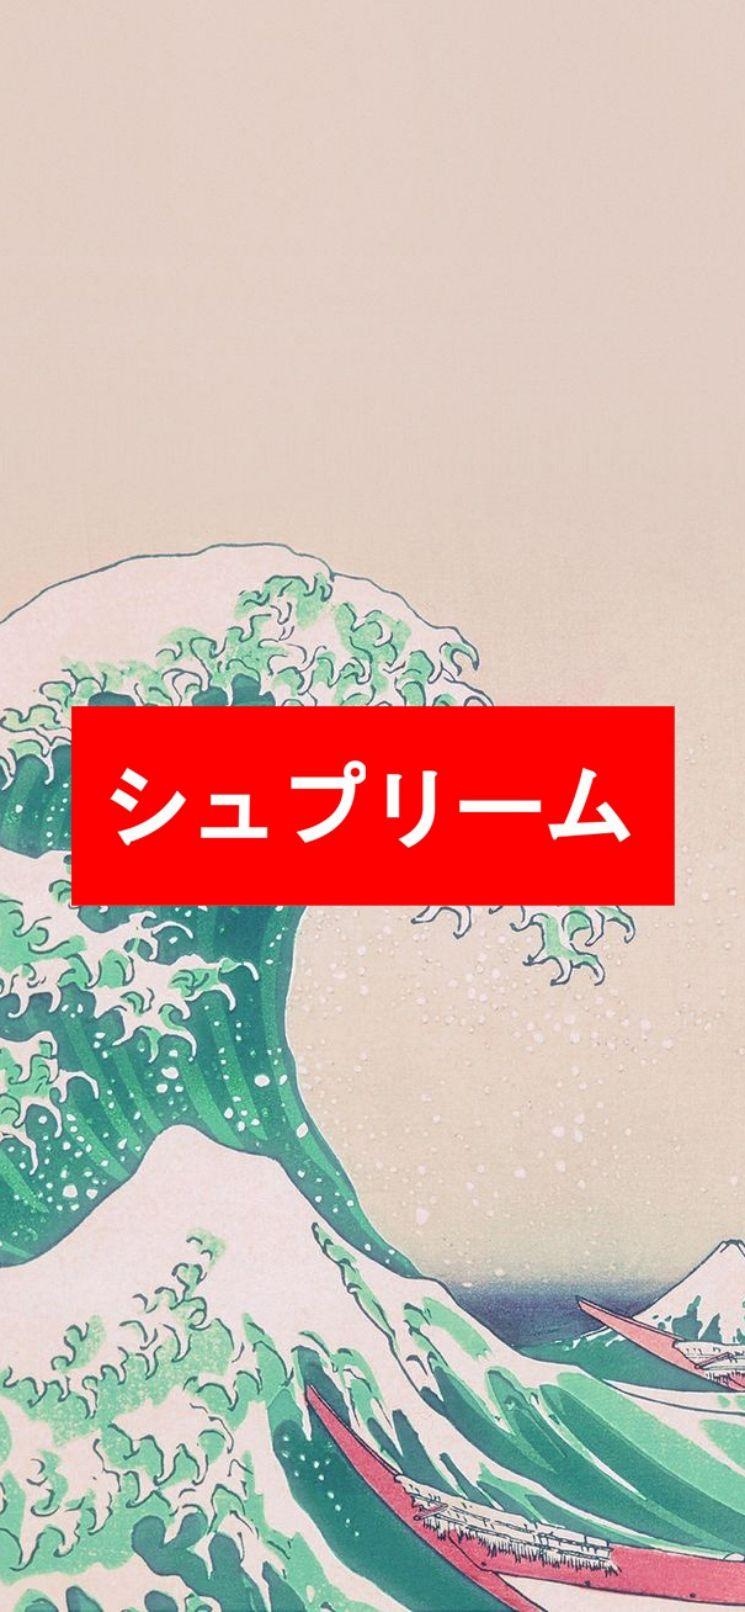 Supreme Japanese Iphone Wallpaper Wallpaper New Wallpaper